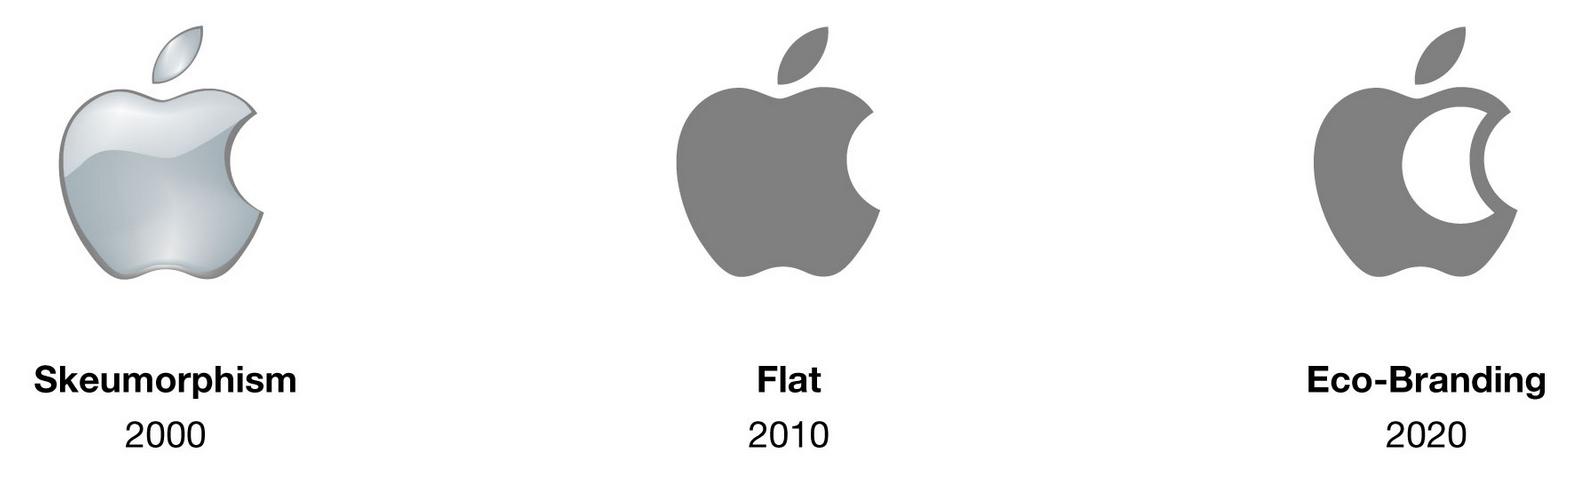 Evolution du logo Apple vers un logo eco conçu